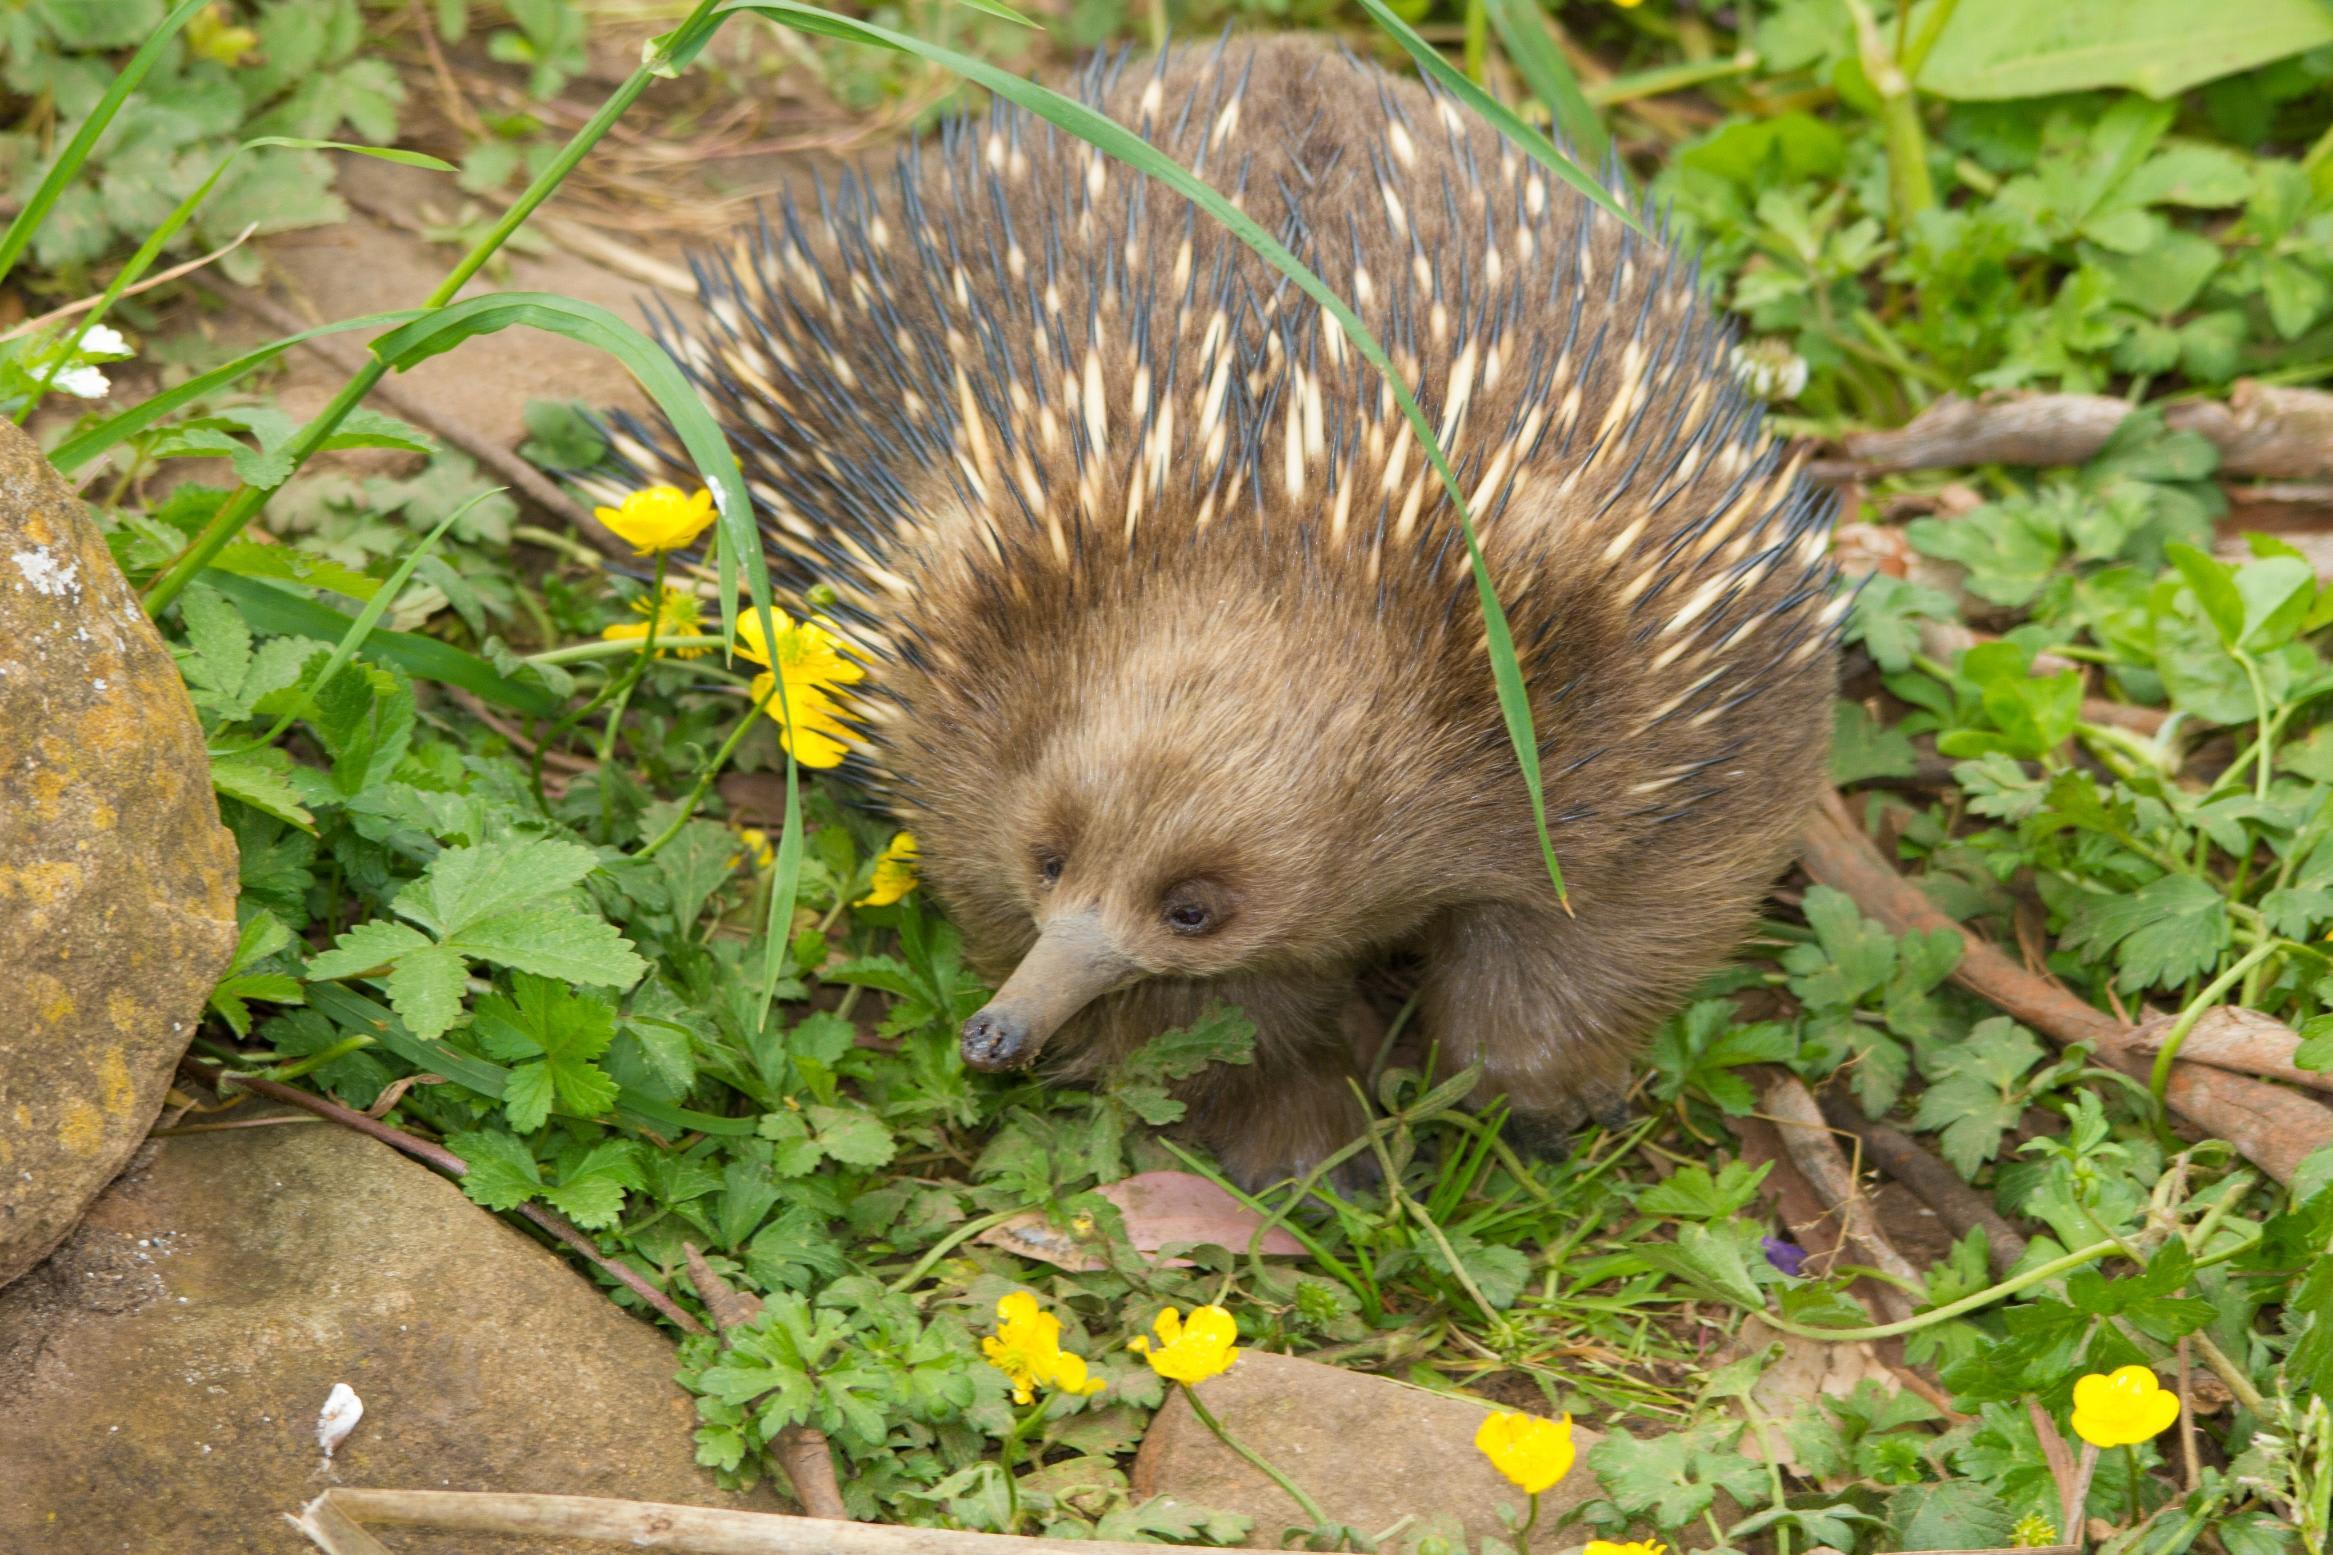 Wildlife Spotting Wilderness Getaway For 2, Tasmania - 3 Nights